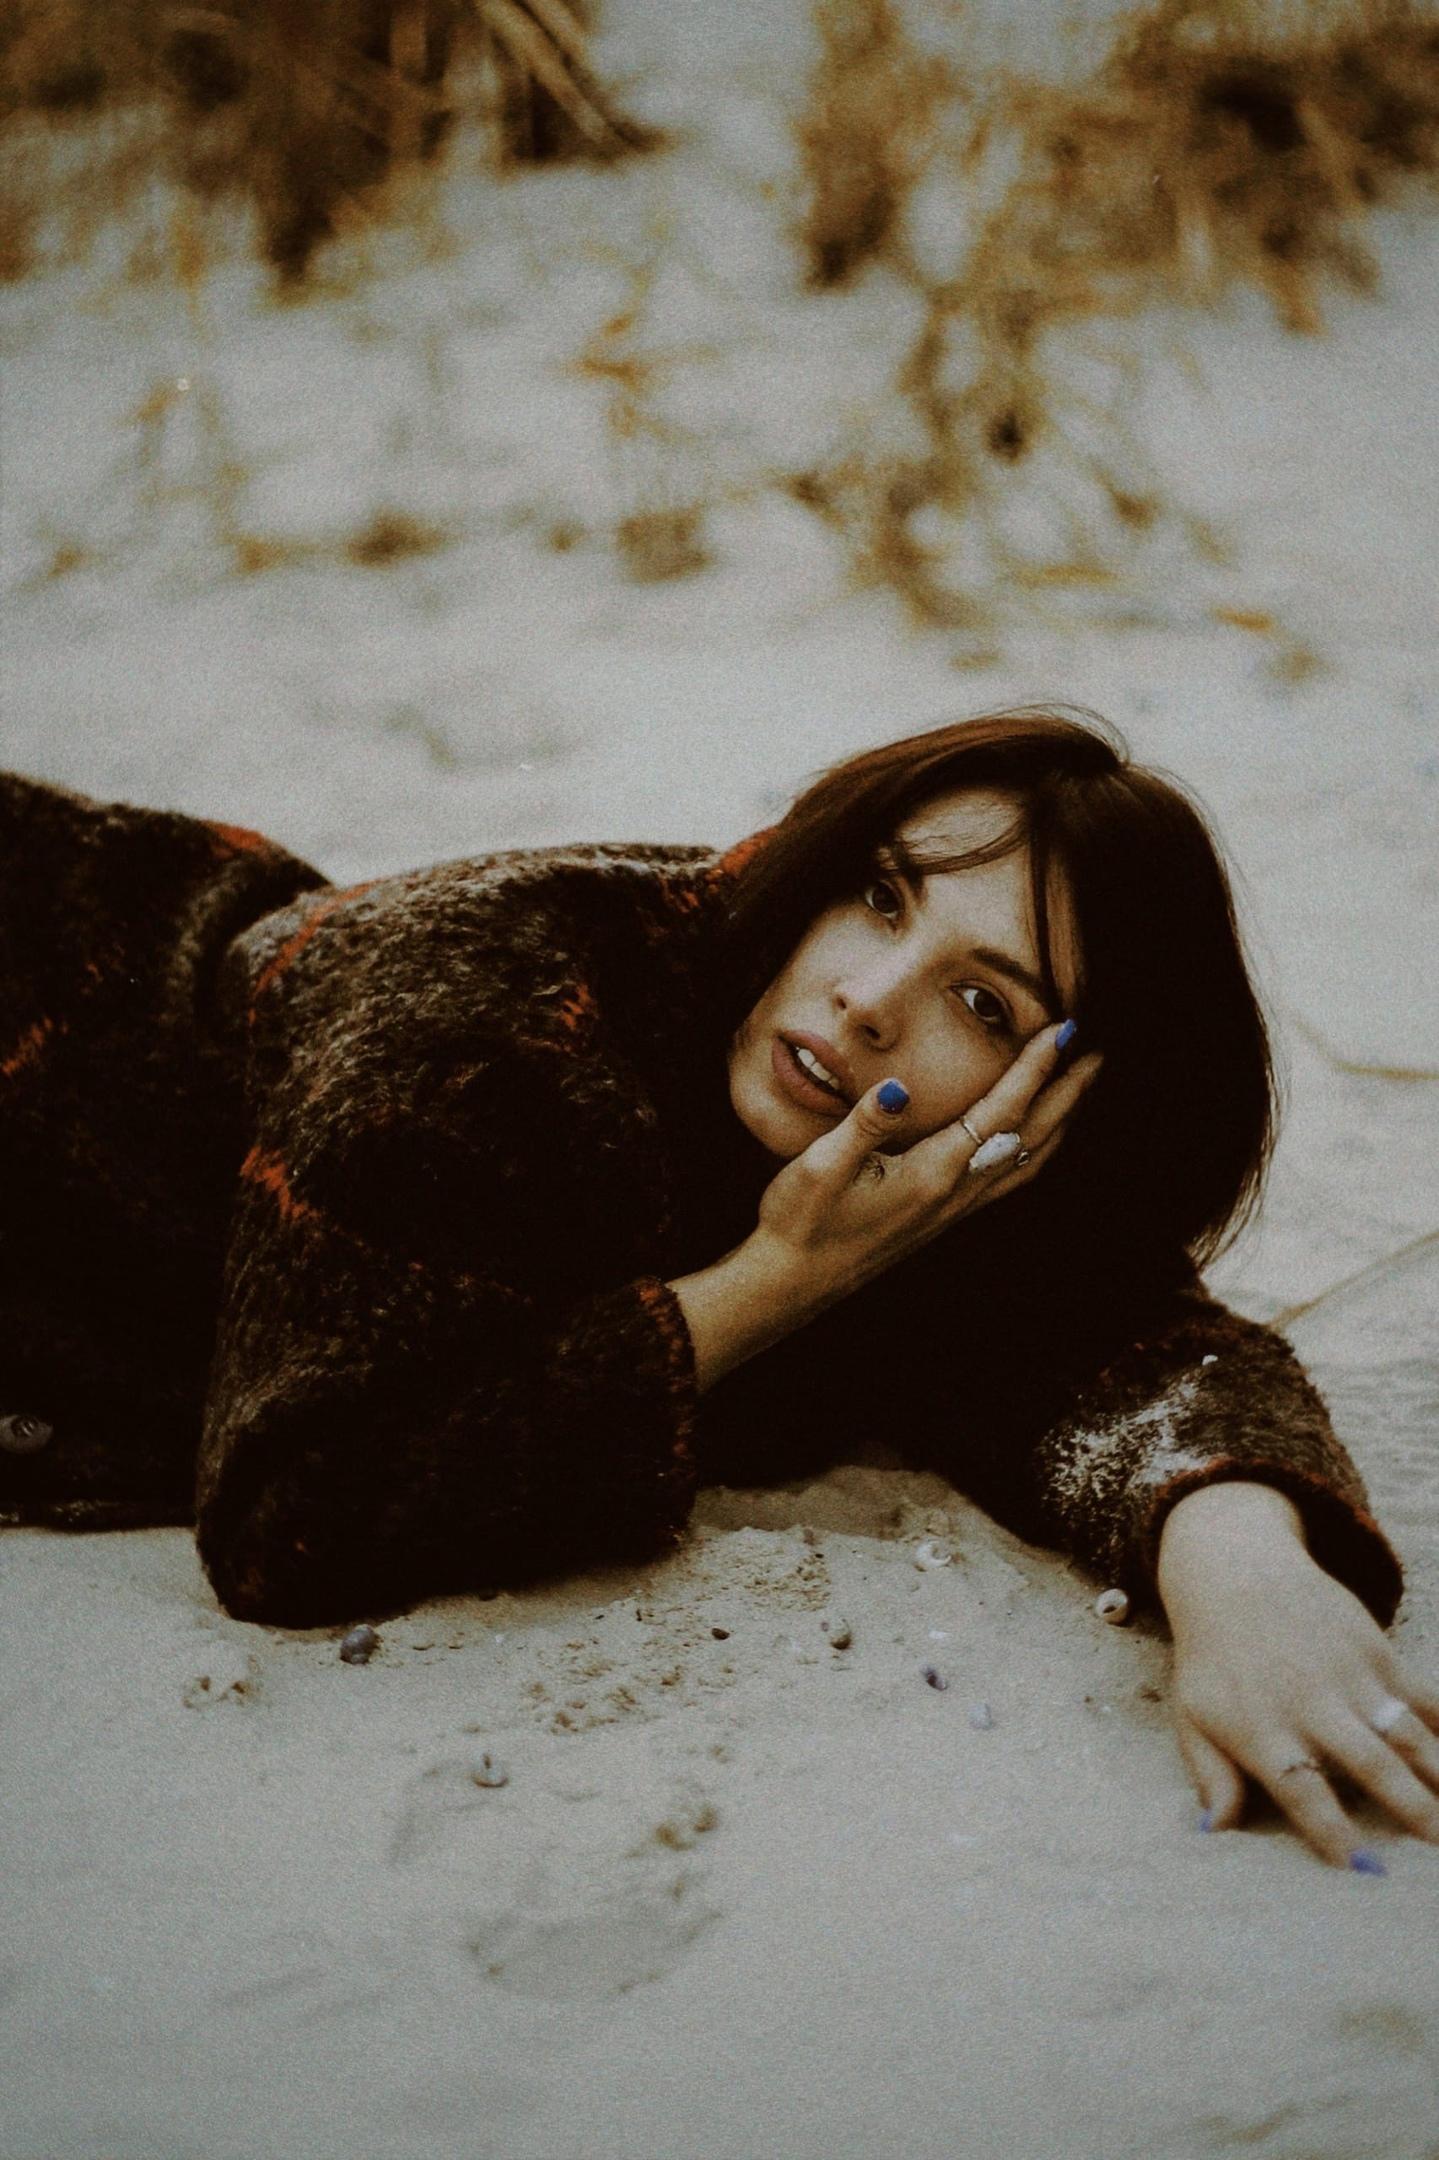 https://www.youngfolks.ru/pub/photographer-darina-bulgakova-model-darina-bulgakova